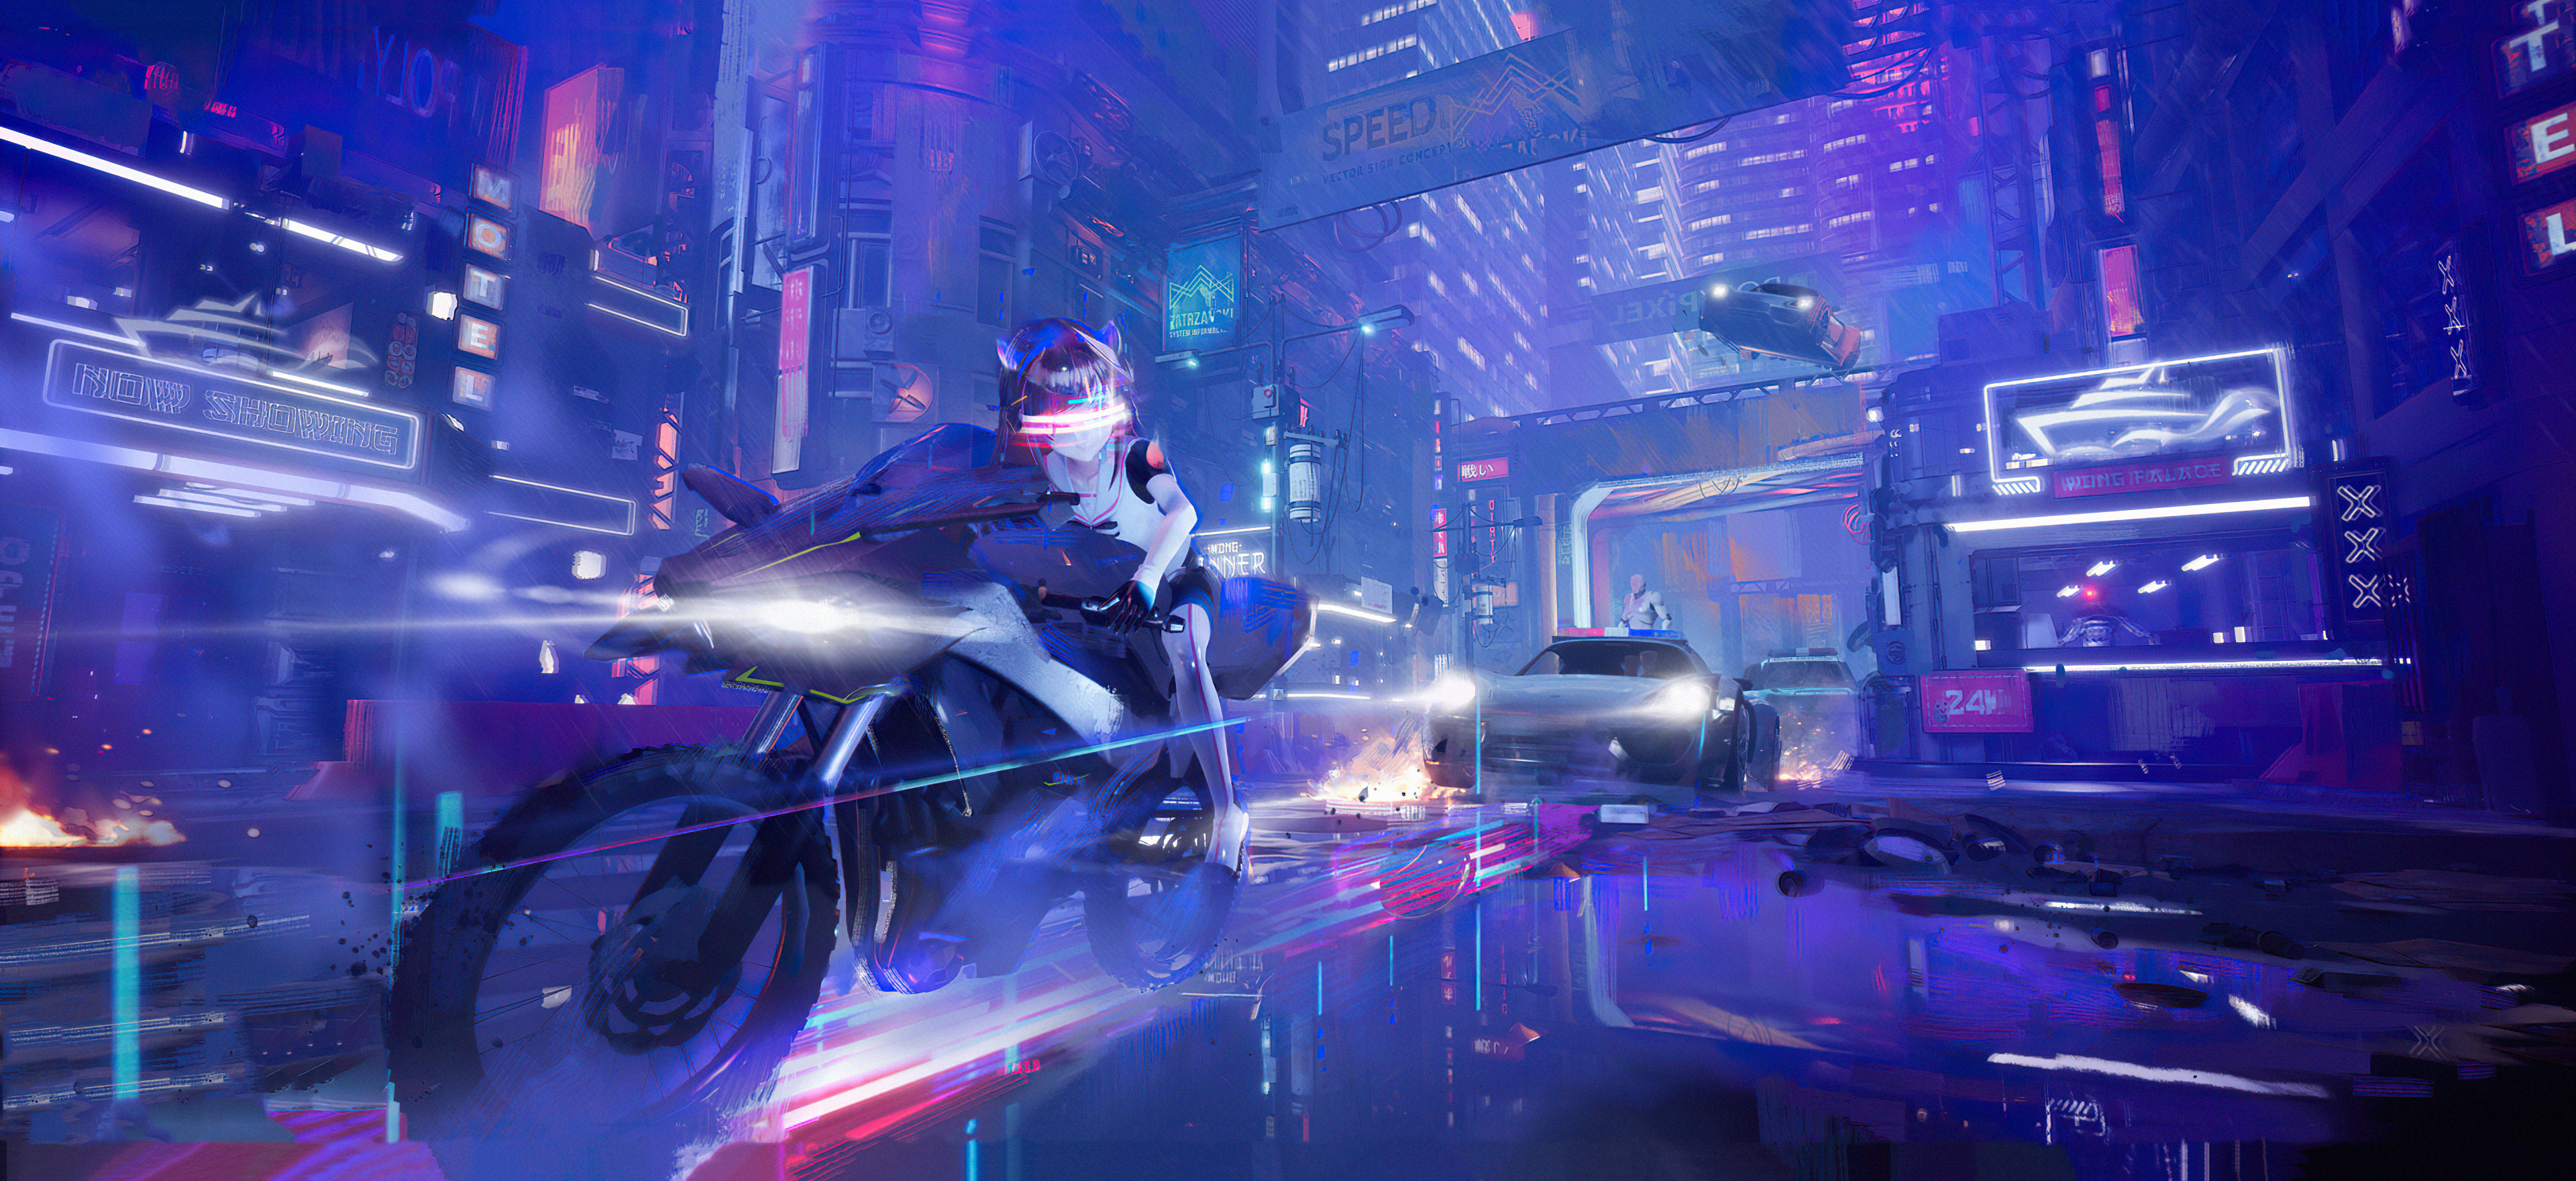 scifi girl bike cyberpunk 4k 1608581778 - Scifi Girl Bike Cyberpunk 4k - Scifi Girl Bike Cyberpunk 4k wallpapers